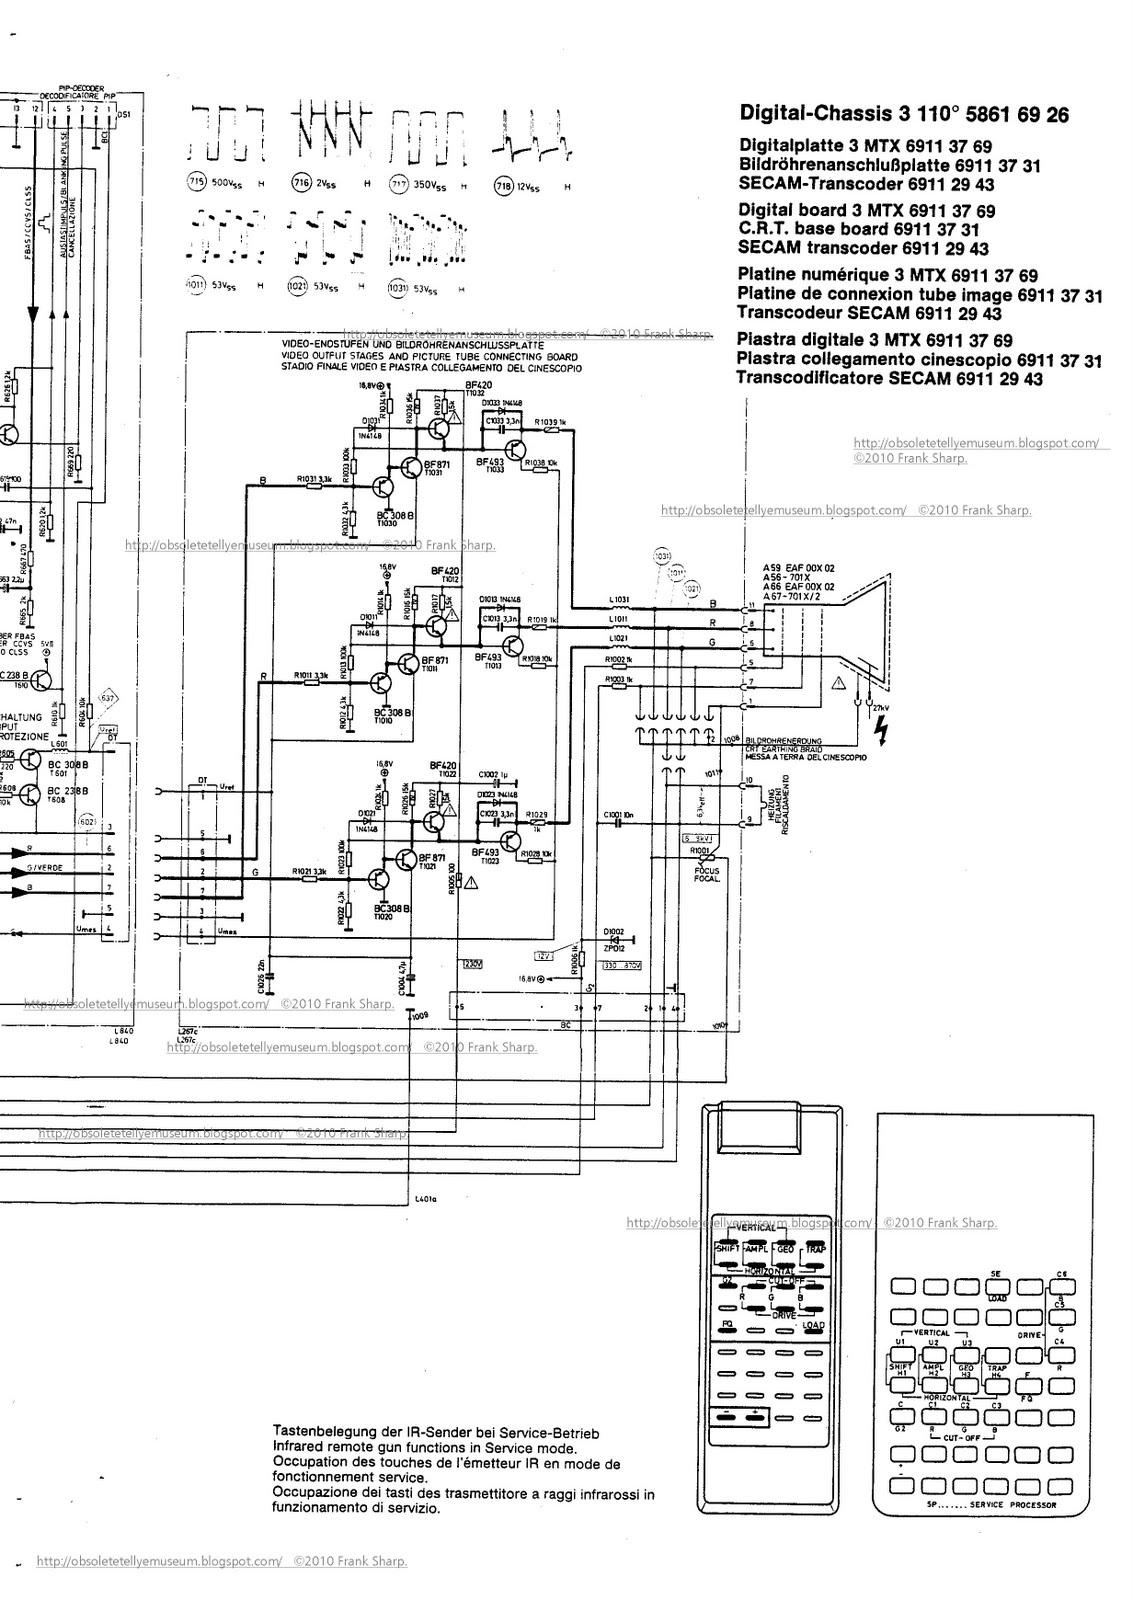 obsolete technology tellye    graetz kongress stereo 4486 digivision  5436 85 61  chassis itt